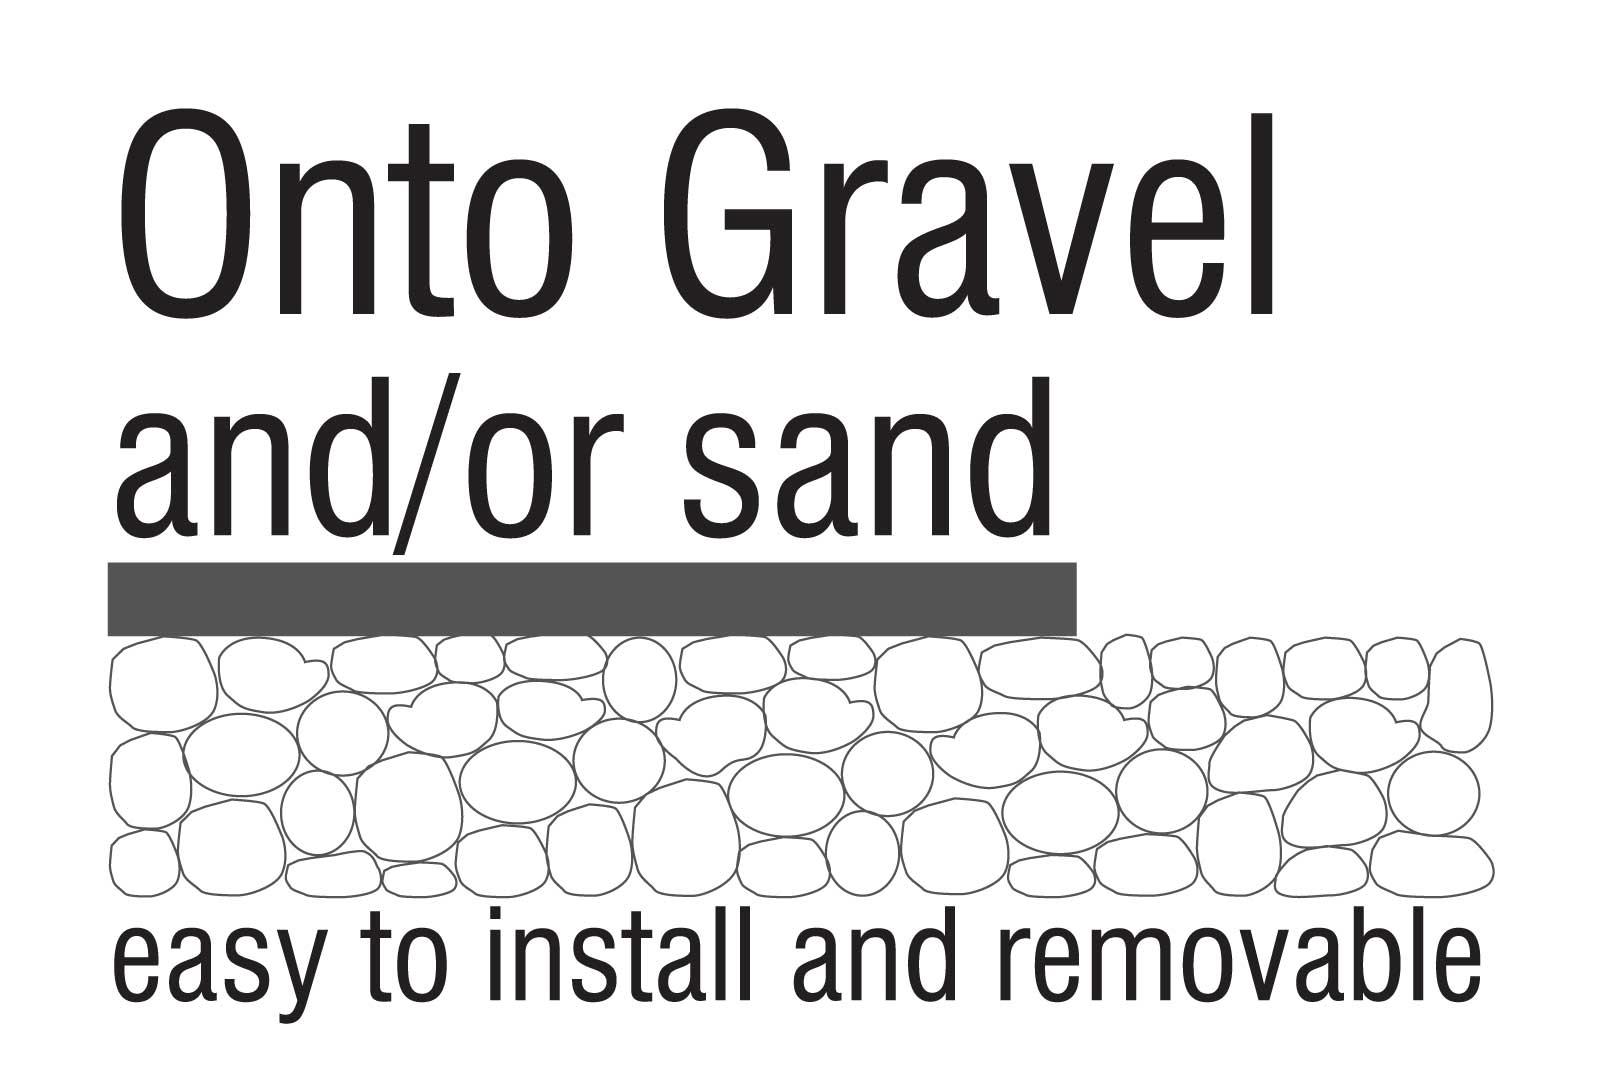 onto-gravel-graphic.jpg